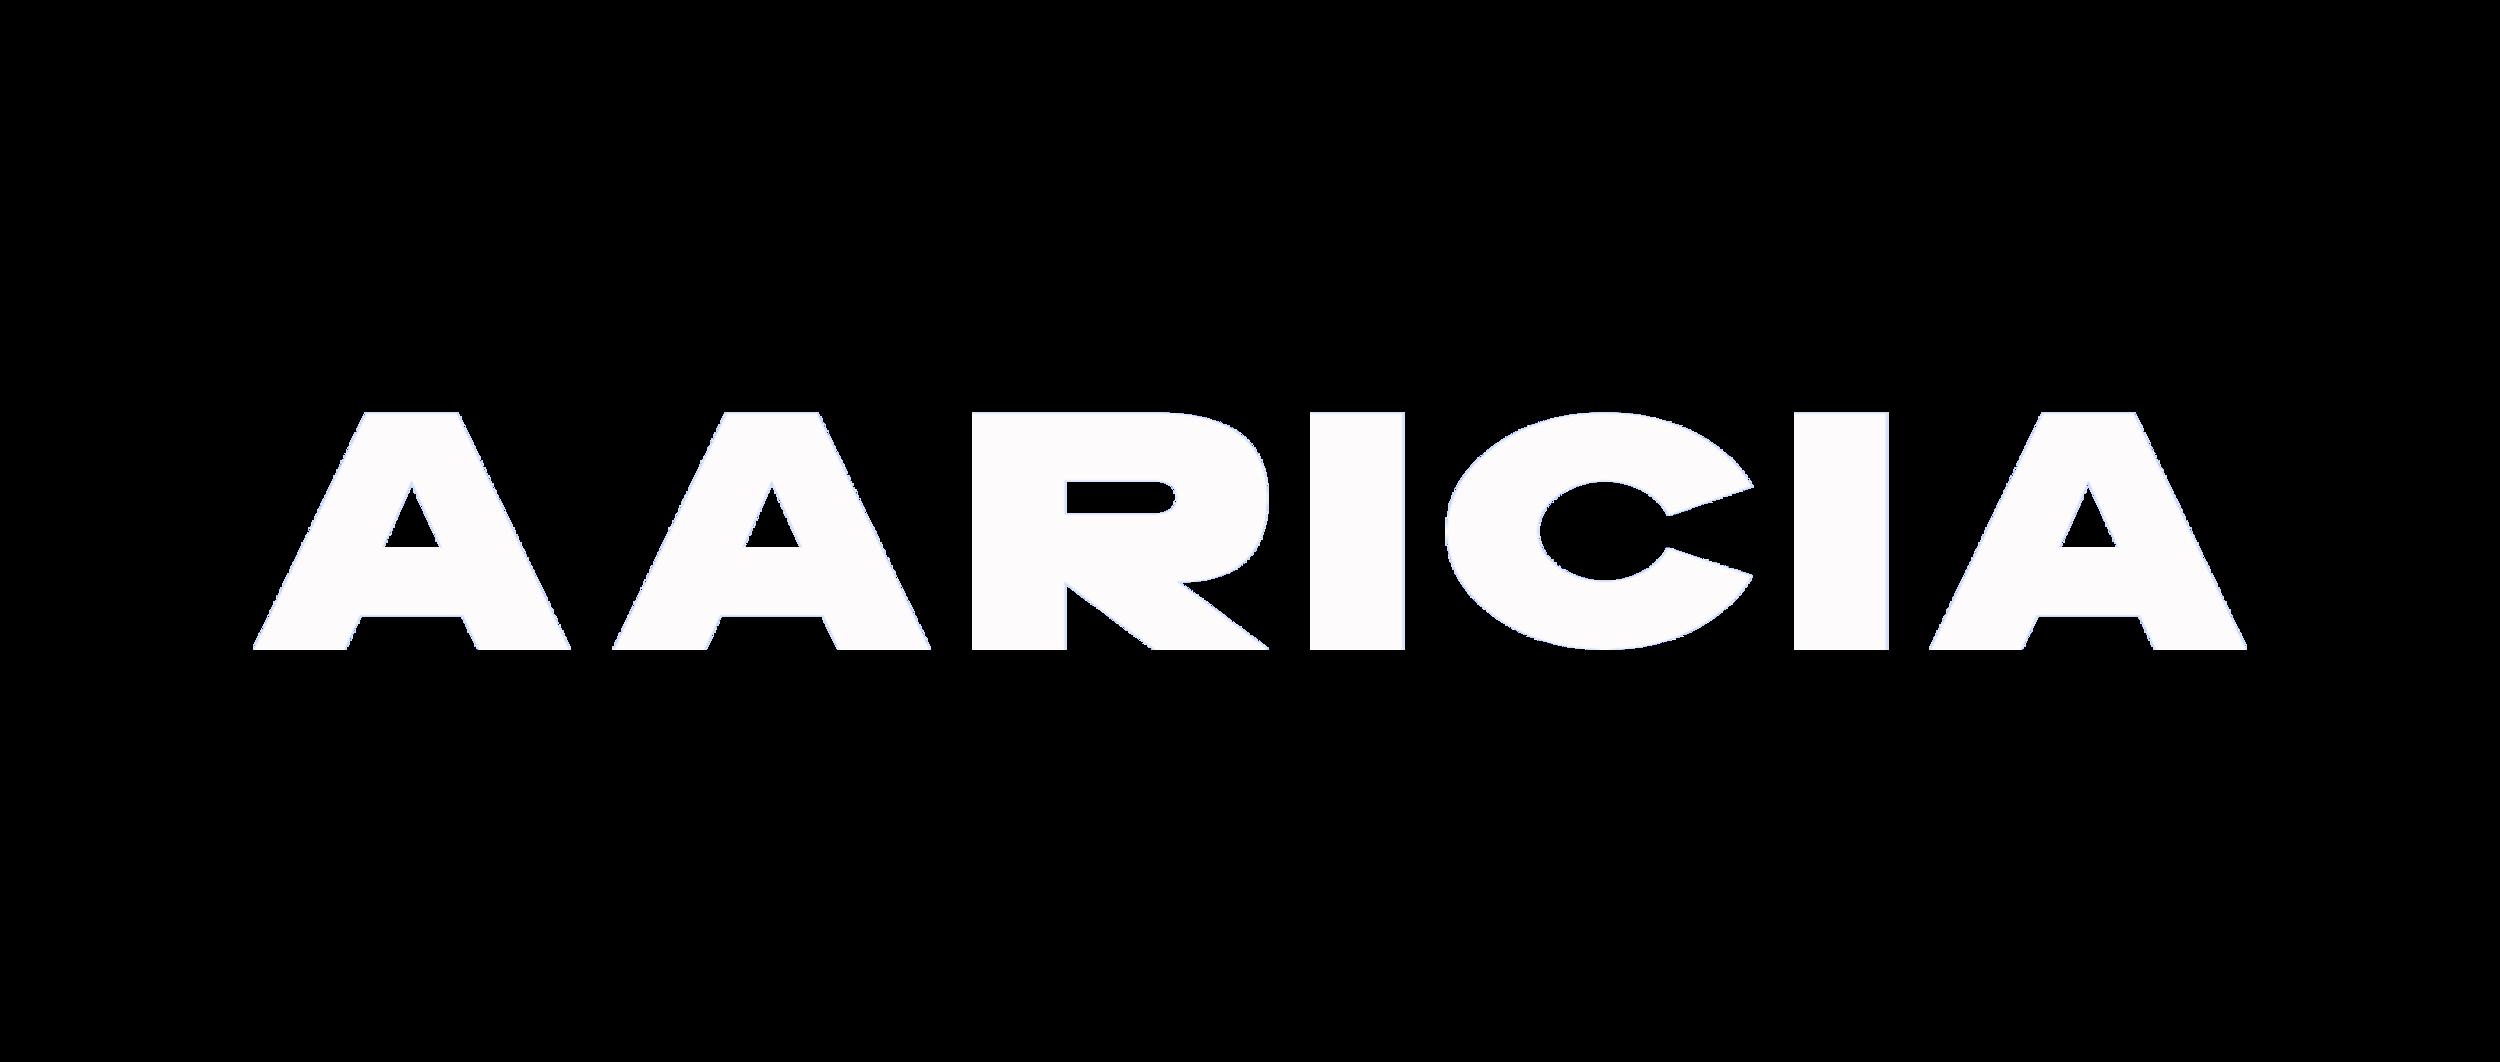 AARICIA TYPO- (1).png